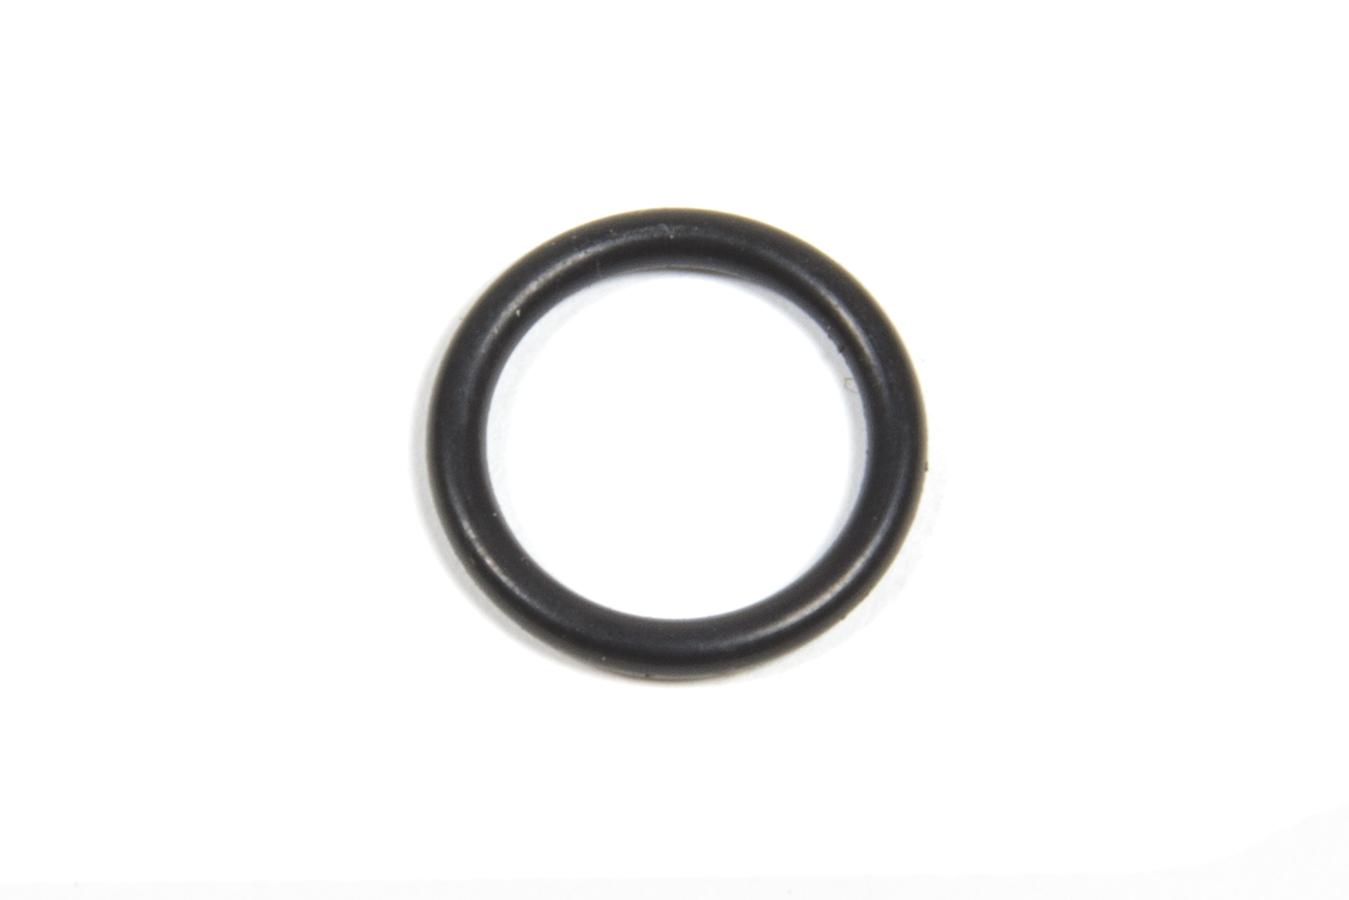 Kinsler 2397 O-Ring, Rubber, Kinsler Fuel Injector Nozzles, Each